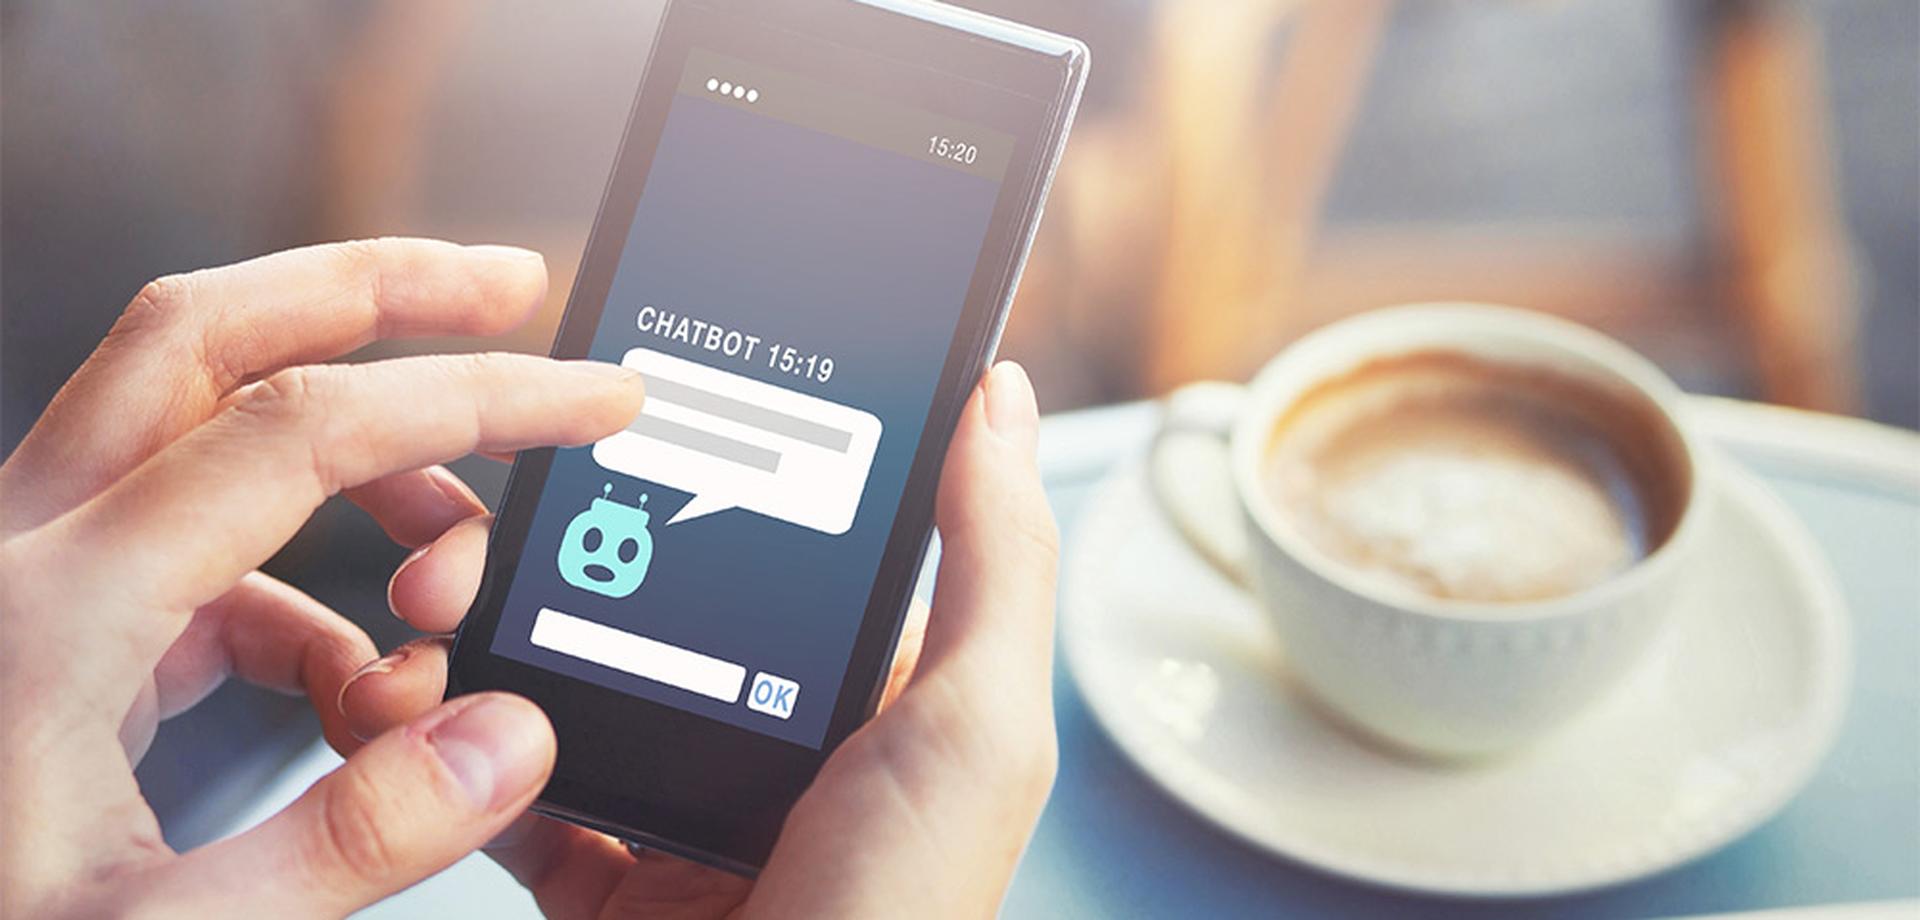 LINK Mobility - Chatbot am Smartphone nutzen